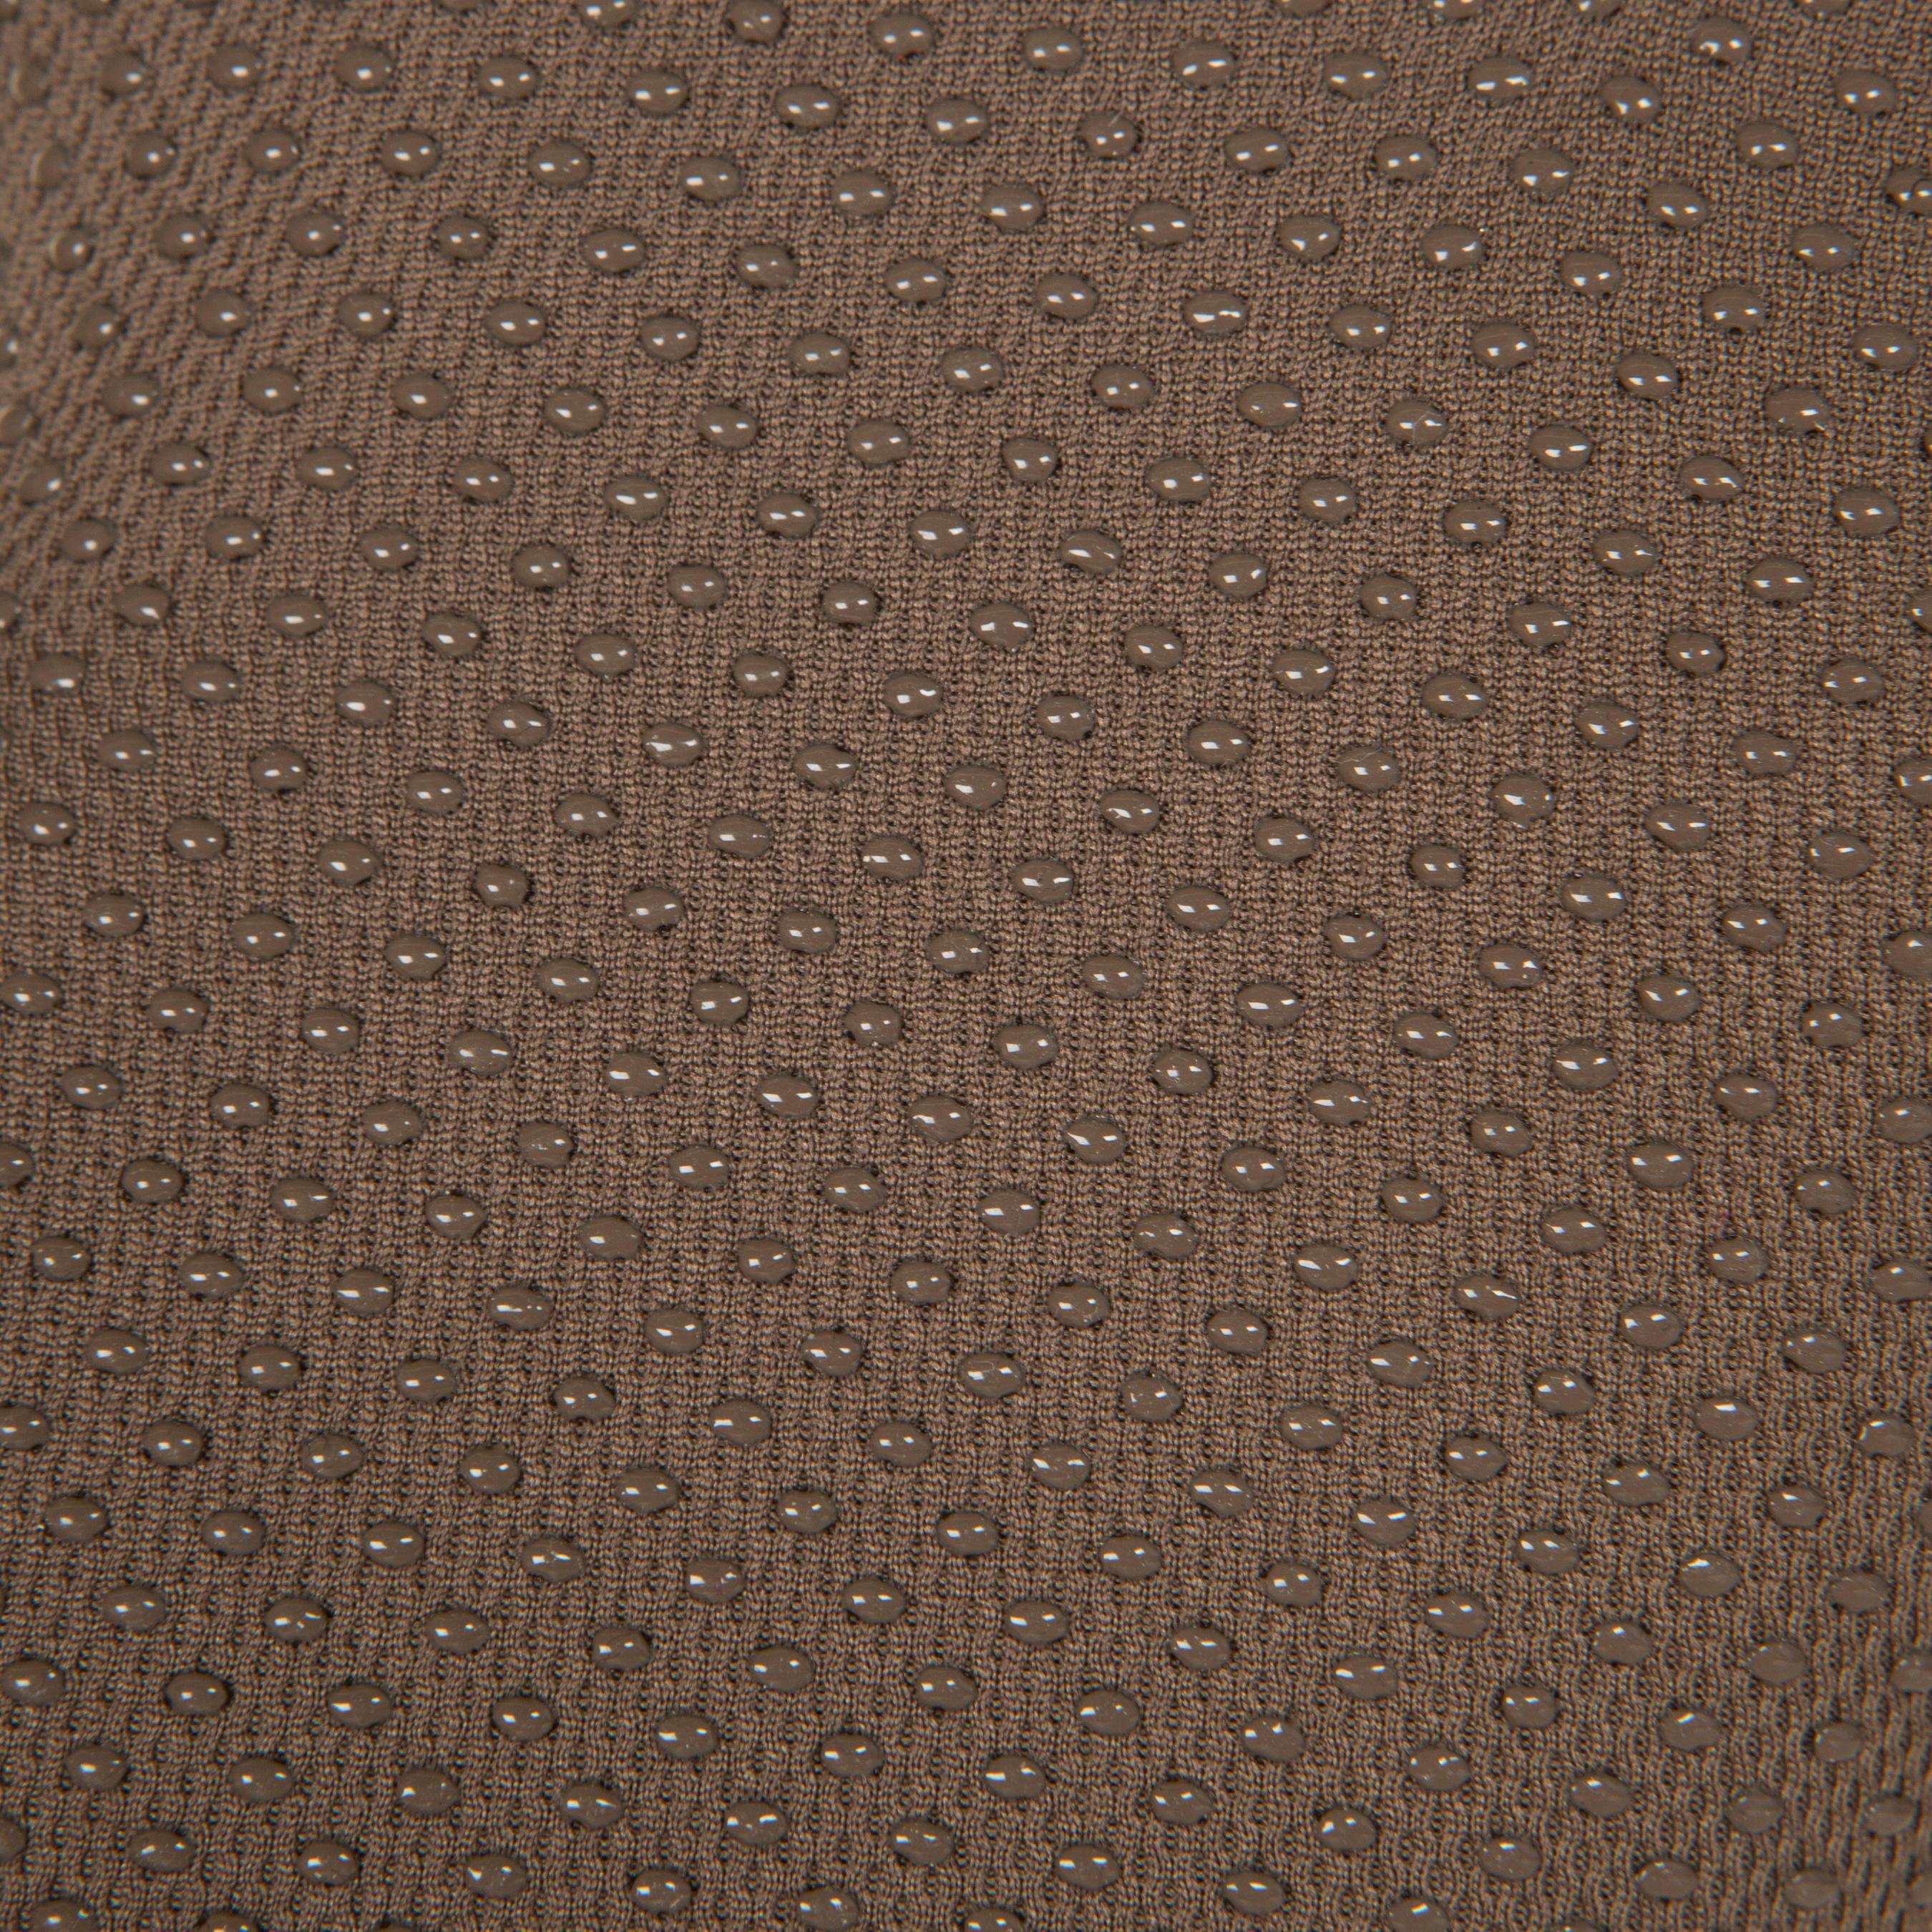 Gants de chasse Actikam 300 camouflage marron